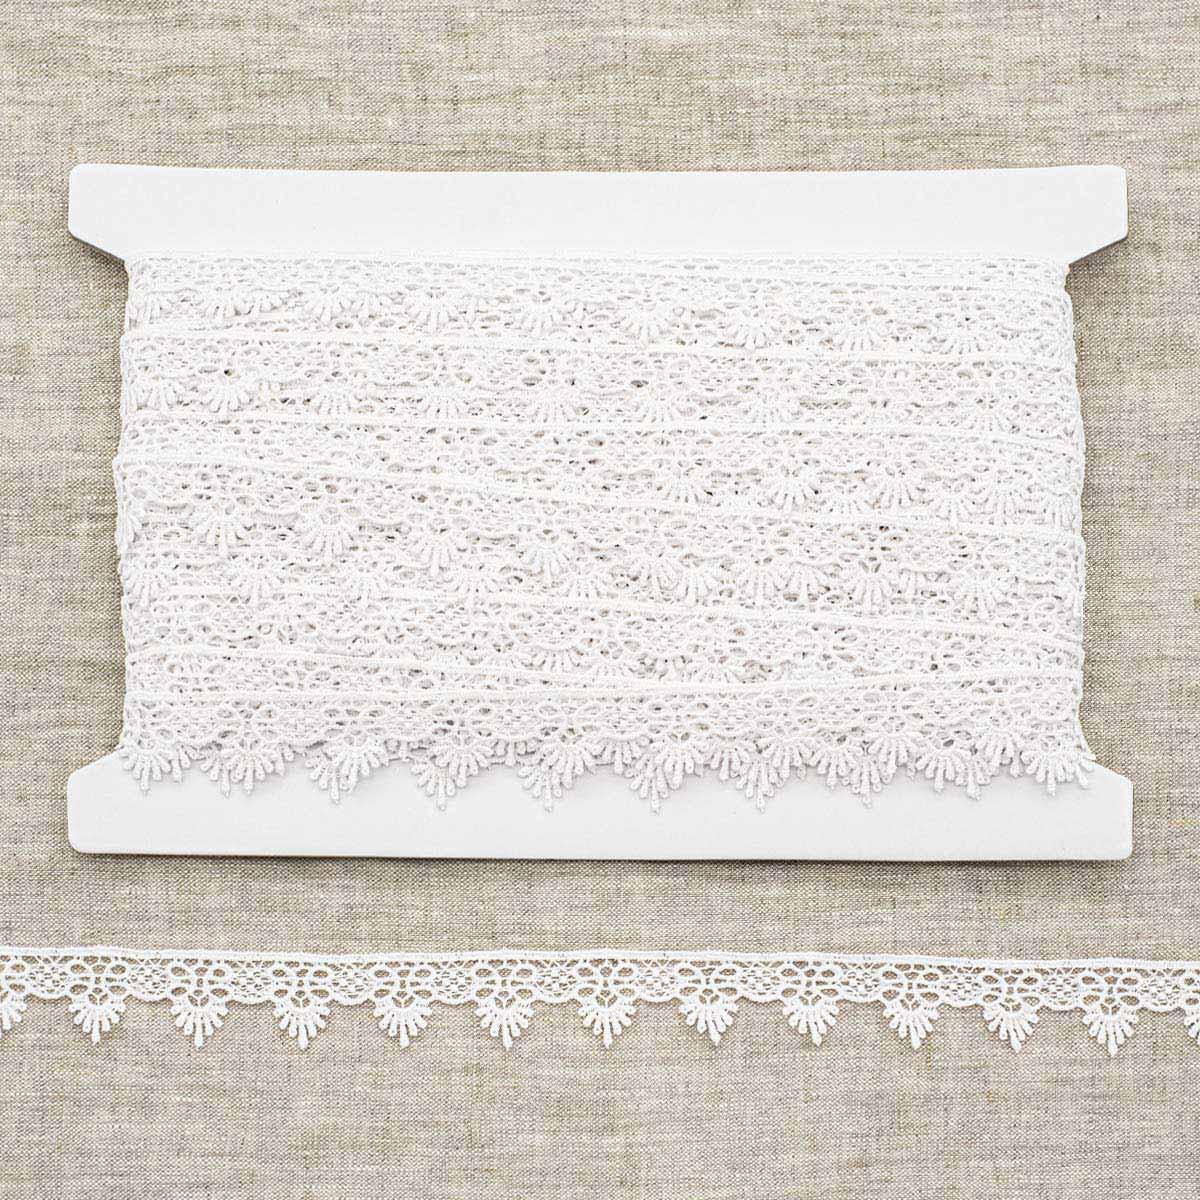 LACH0114 Кружево вязаное, 2,5 см*25 м